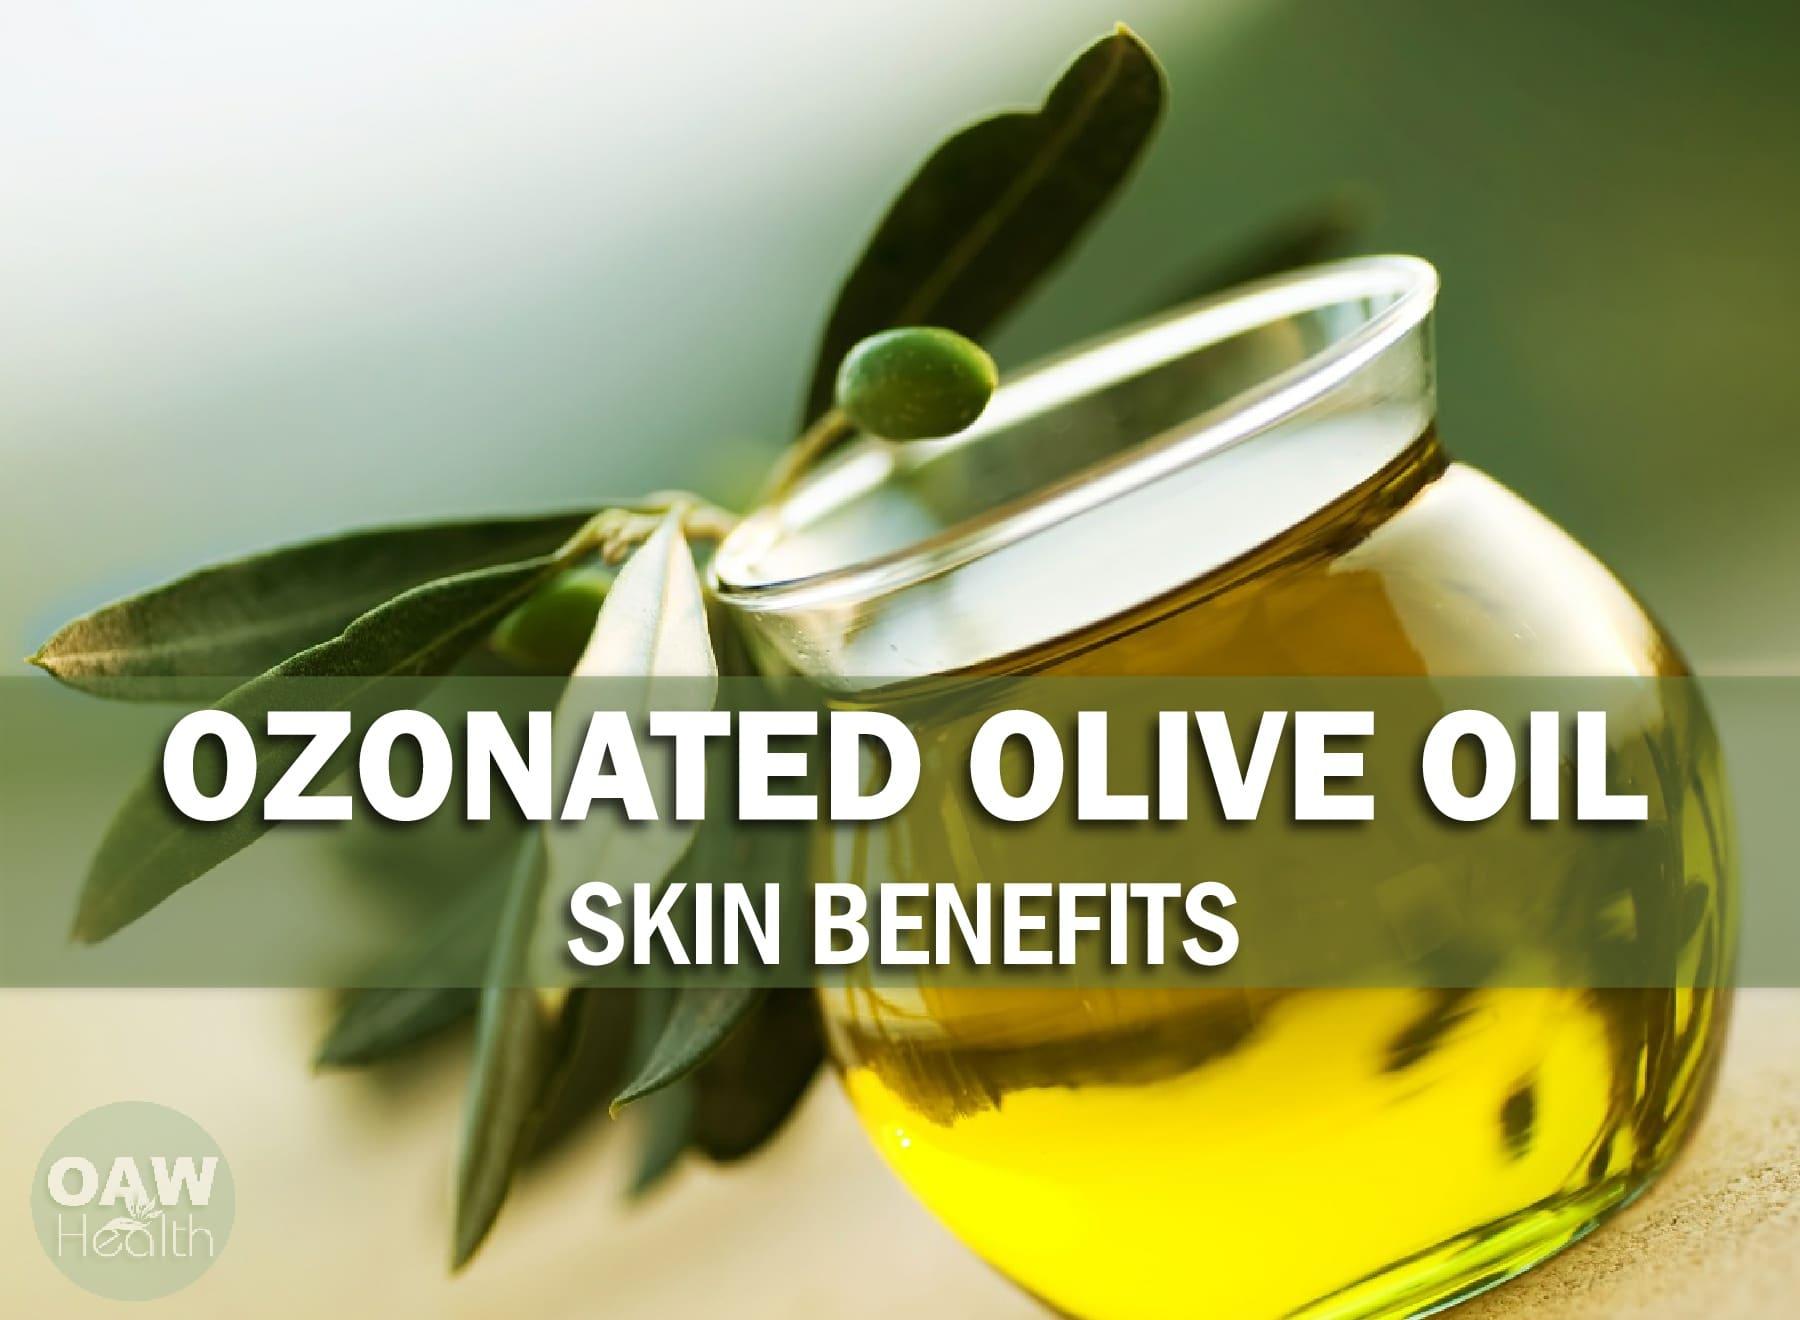 Ozonated Olive Oil Skin Benefits